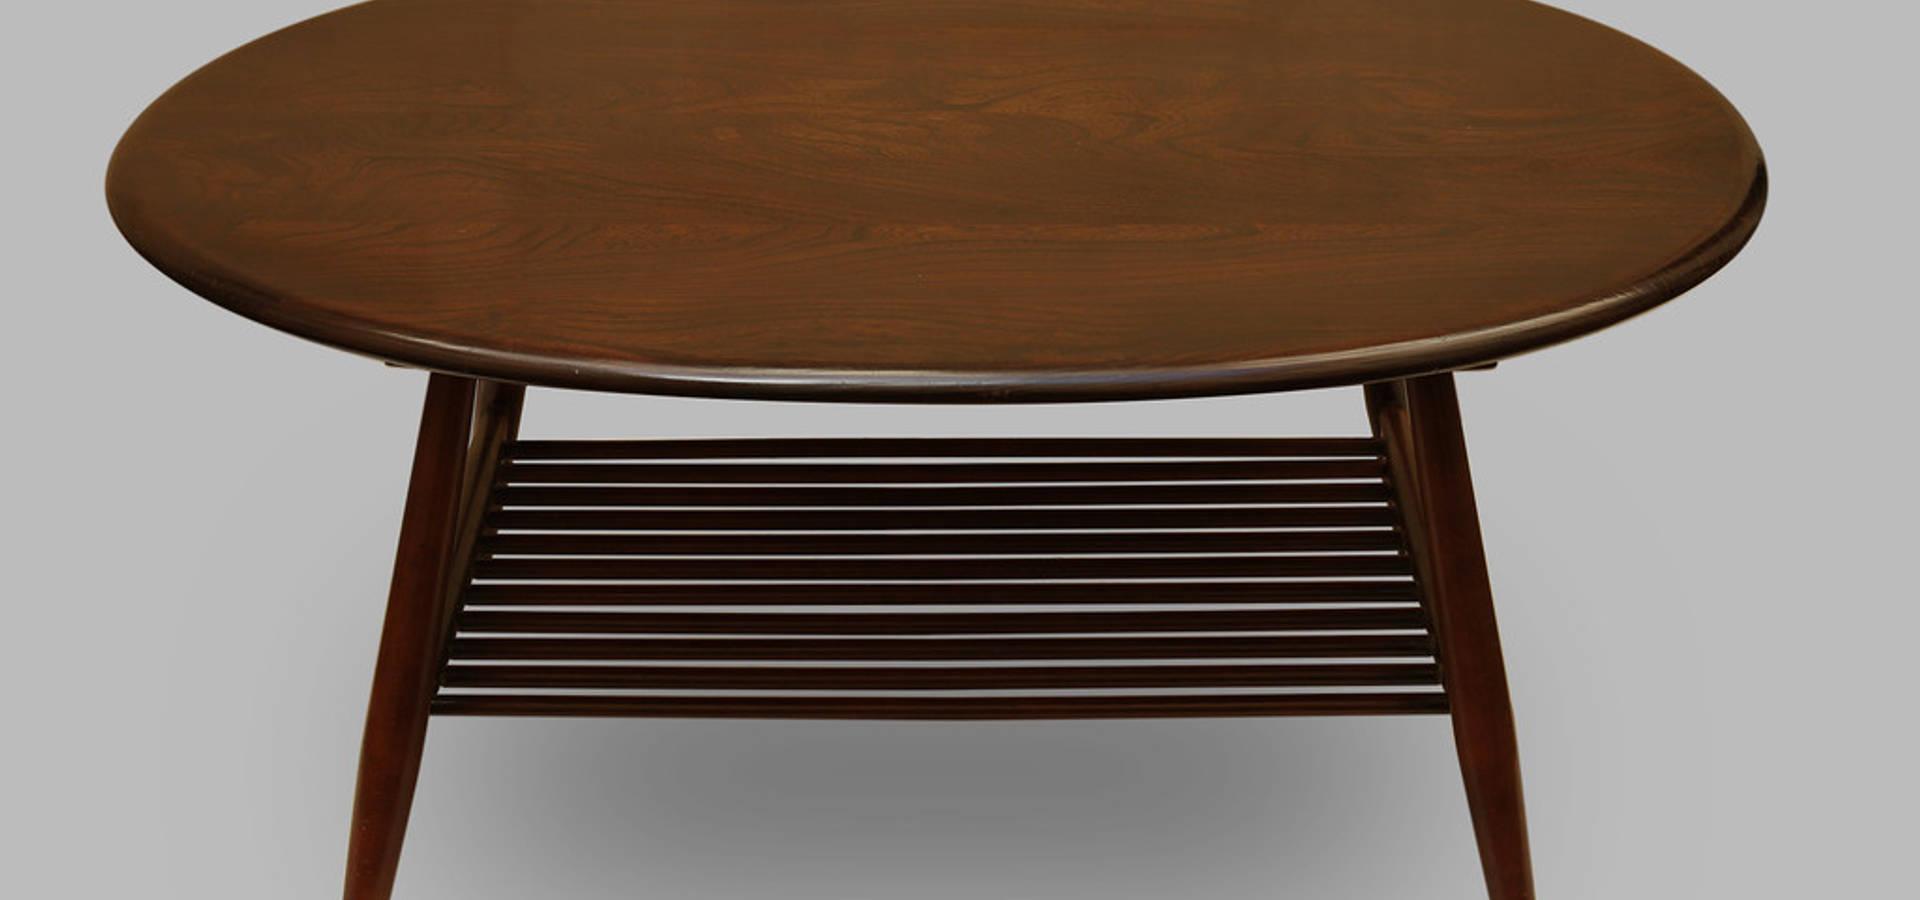 tcha tcha tcha boutique en ligne paris sur homify. Black Bedroom Furniture Sets. Home Design Ideas